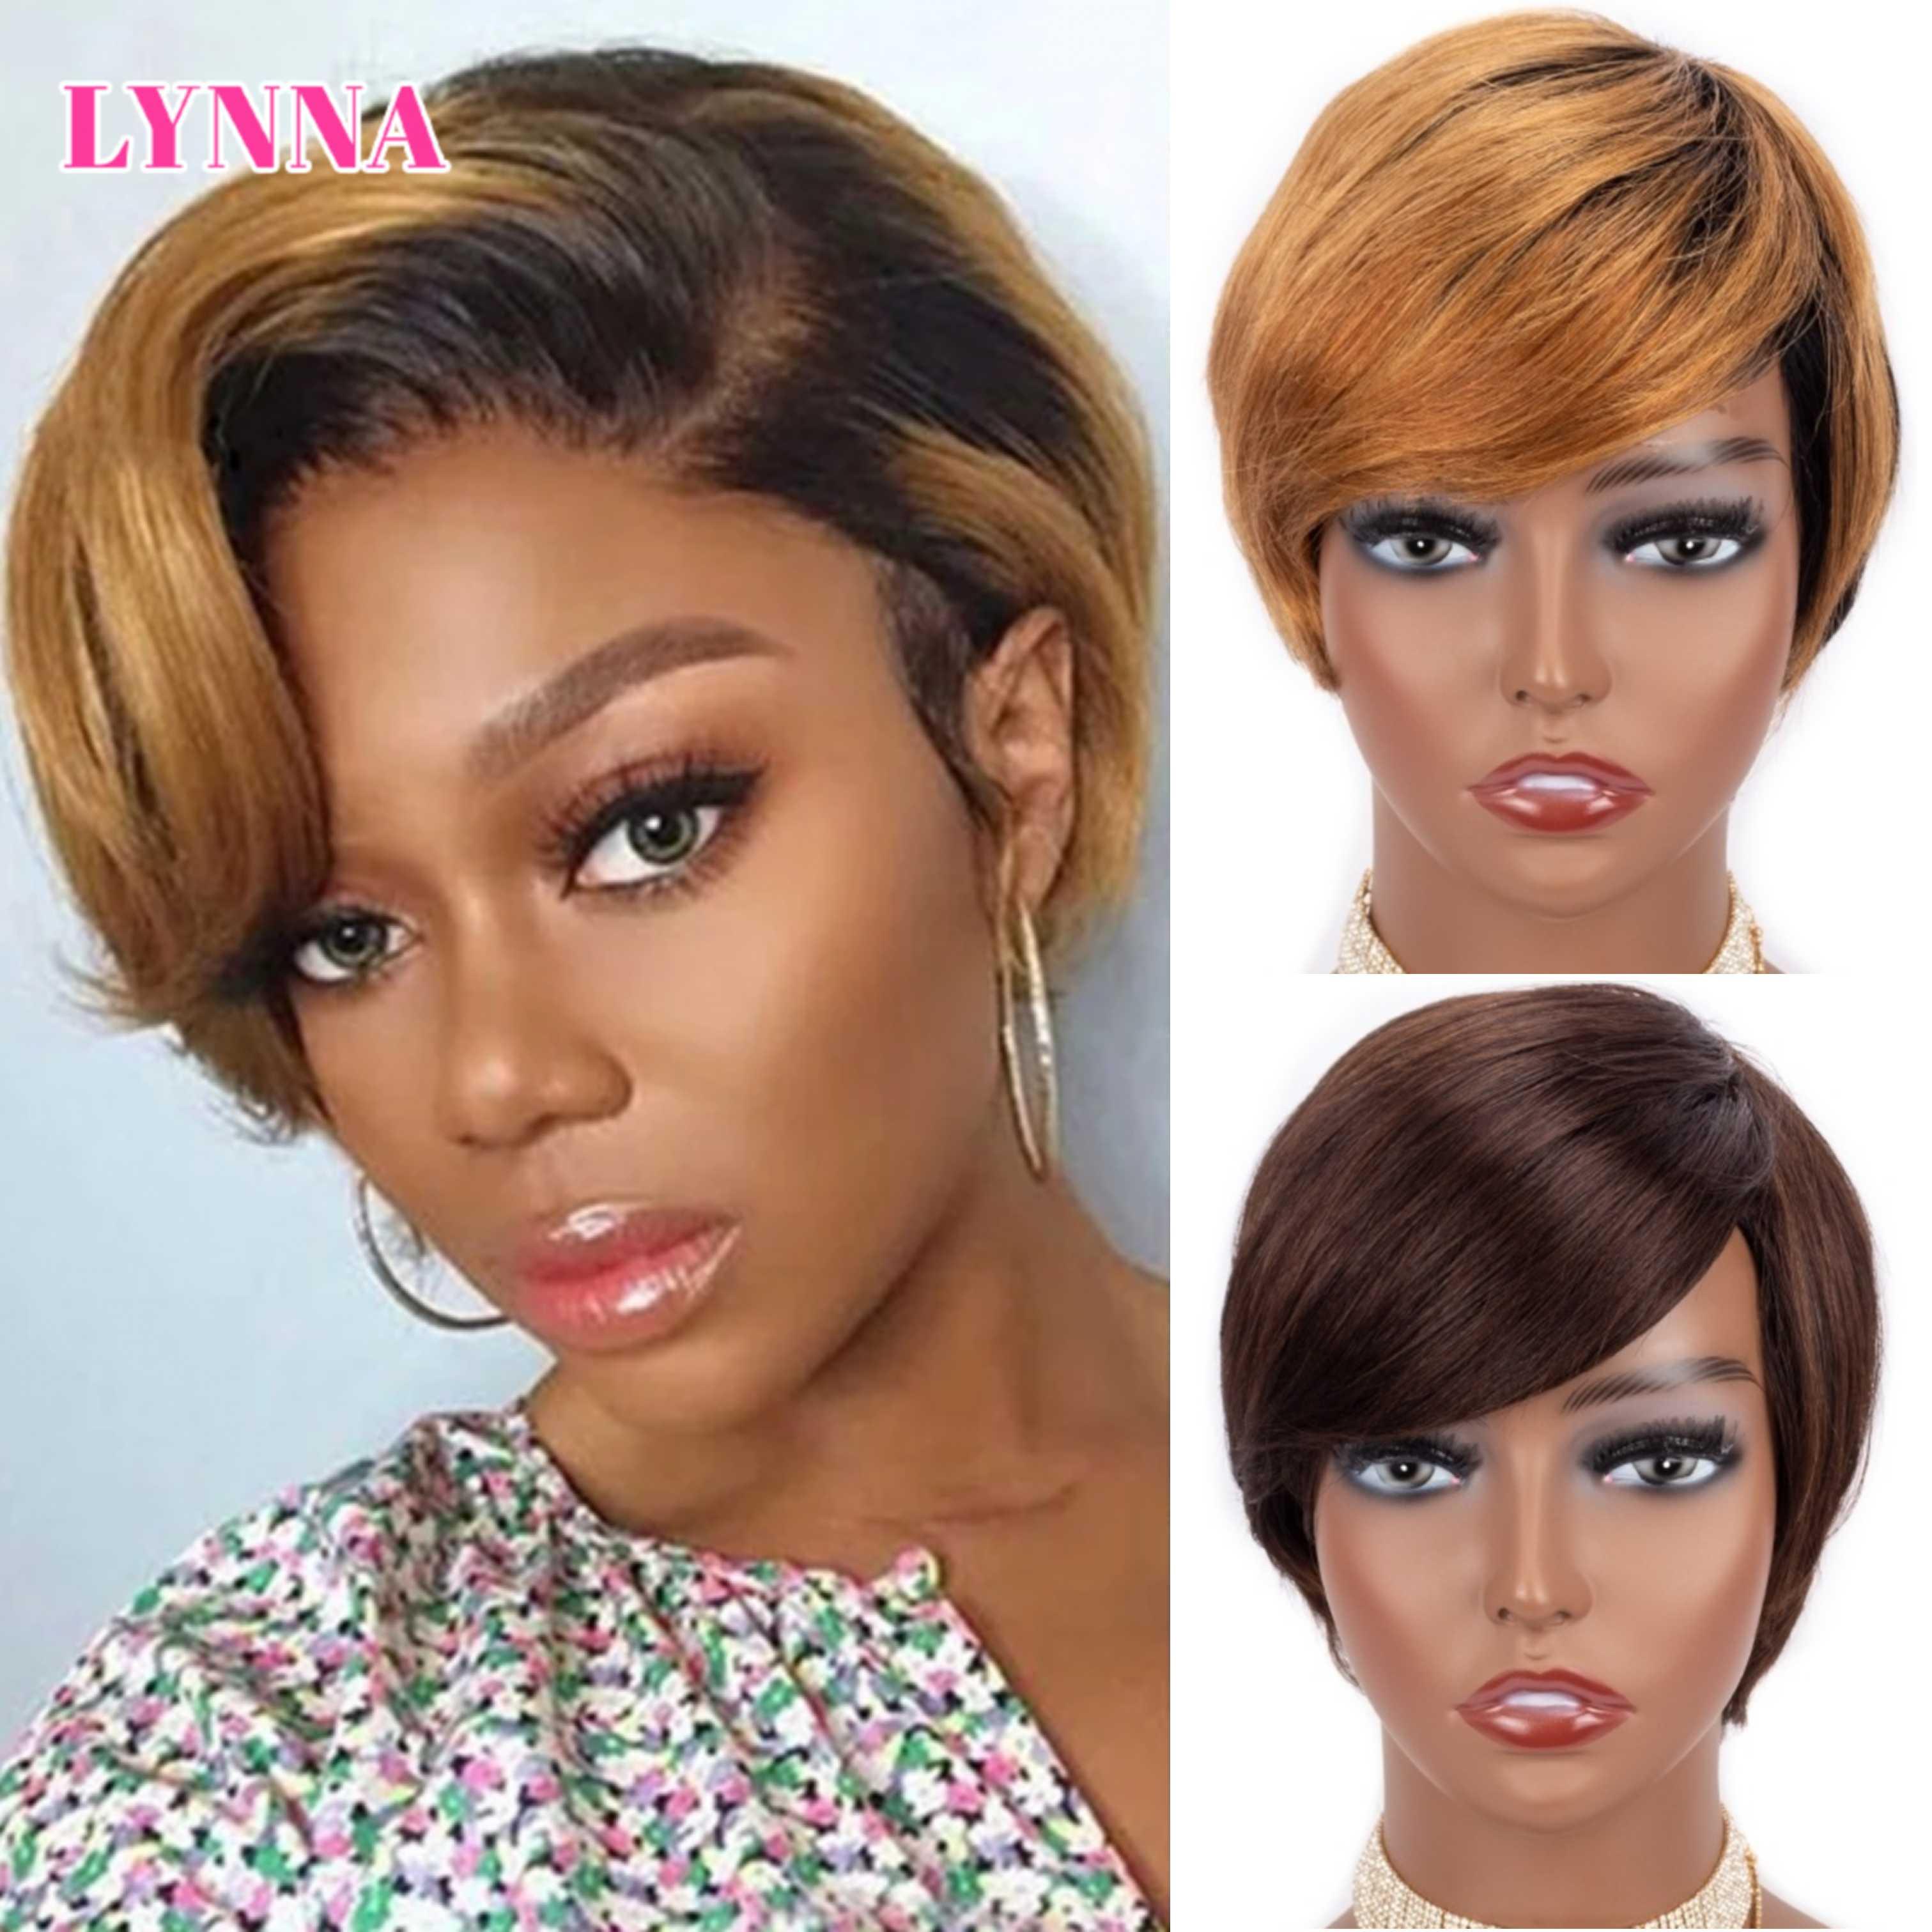 parrucca-pixie-cut-parrucche-diritte-bob-parrucche-corte-con-frangia-miele-biondo-ombre-colore-parrucca-per-capelli-umani-a-macchina-piena-per-donne-nere